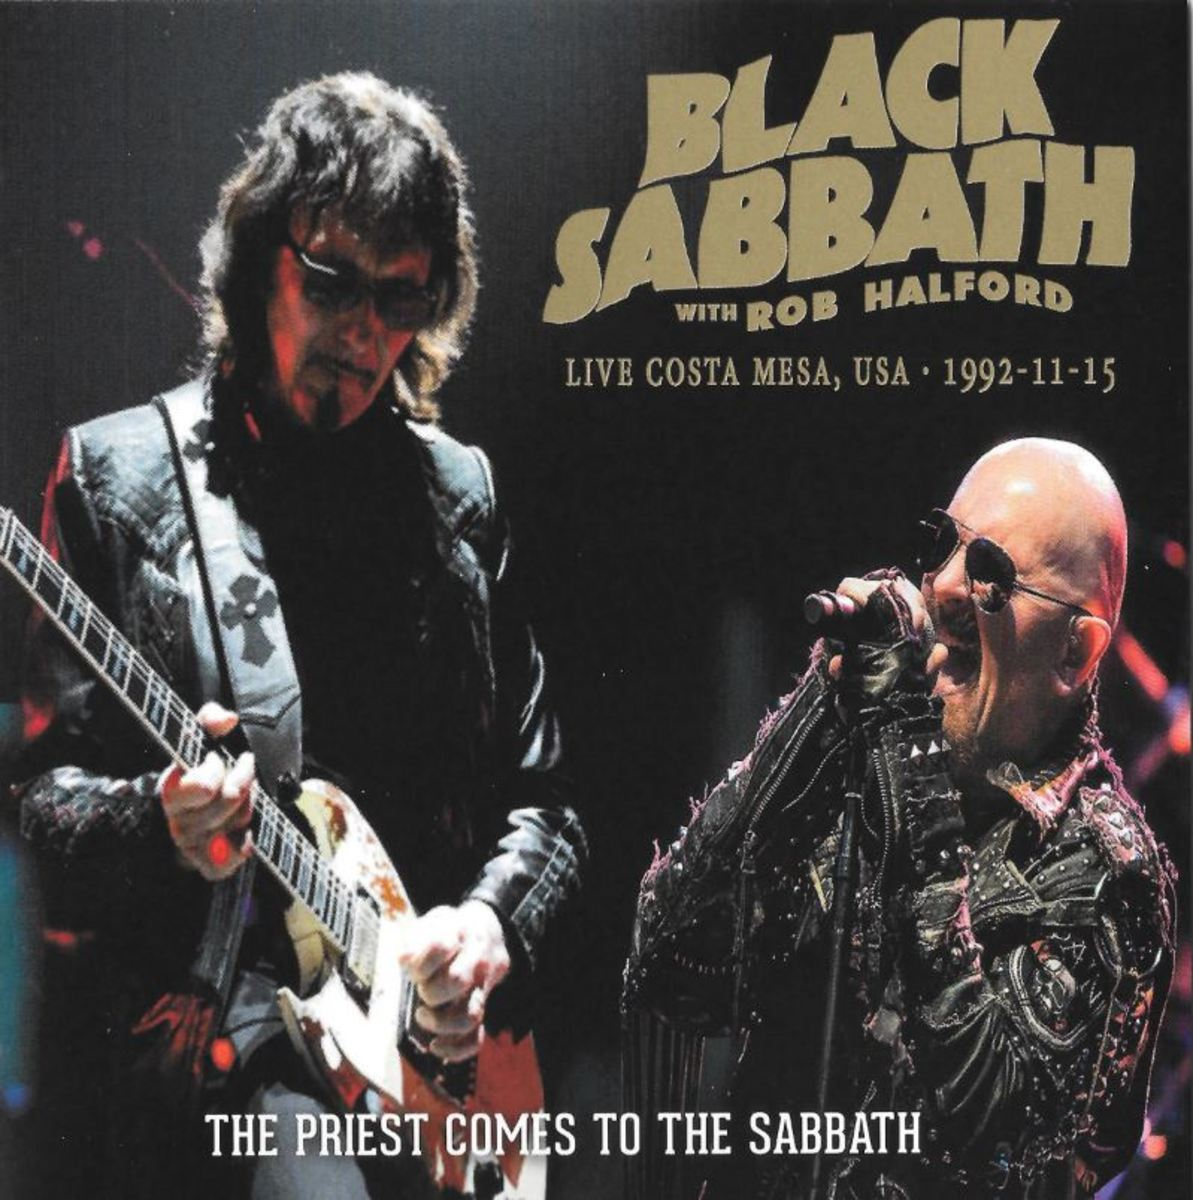 The Night Rob Halford Saved Black Sabbath